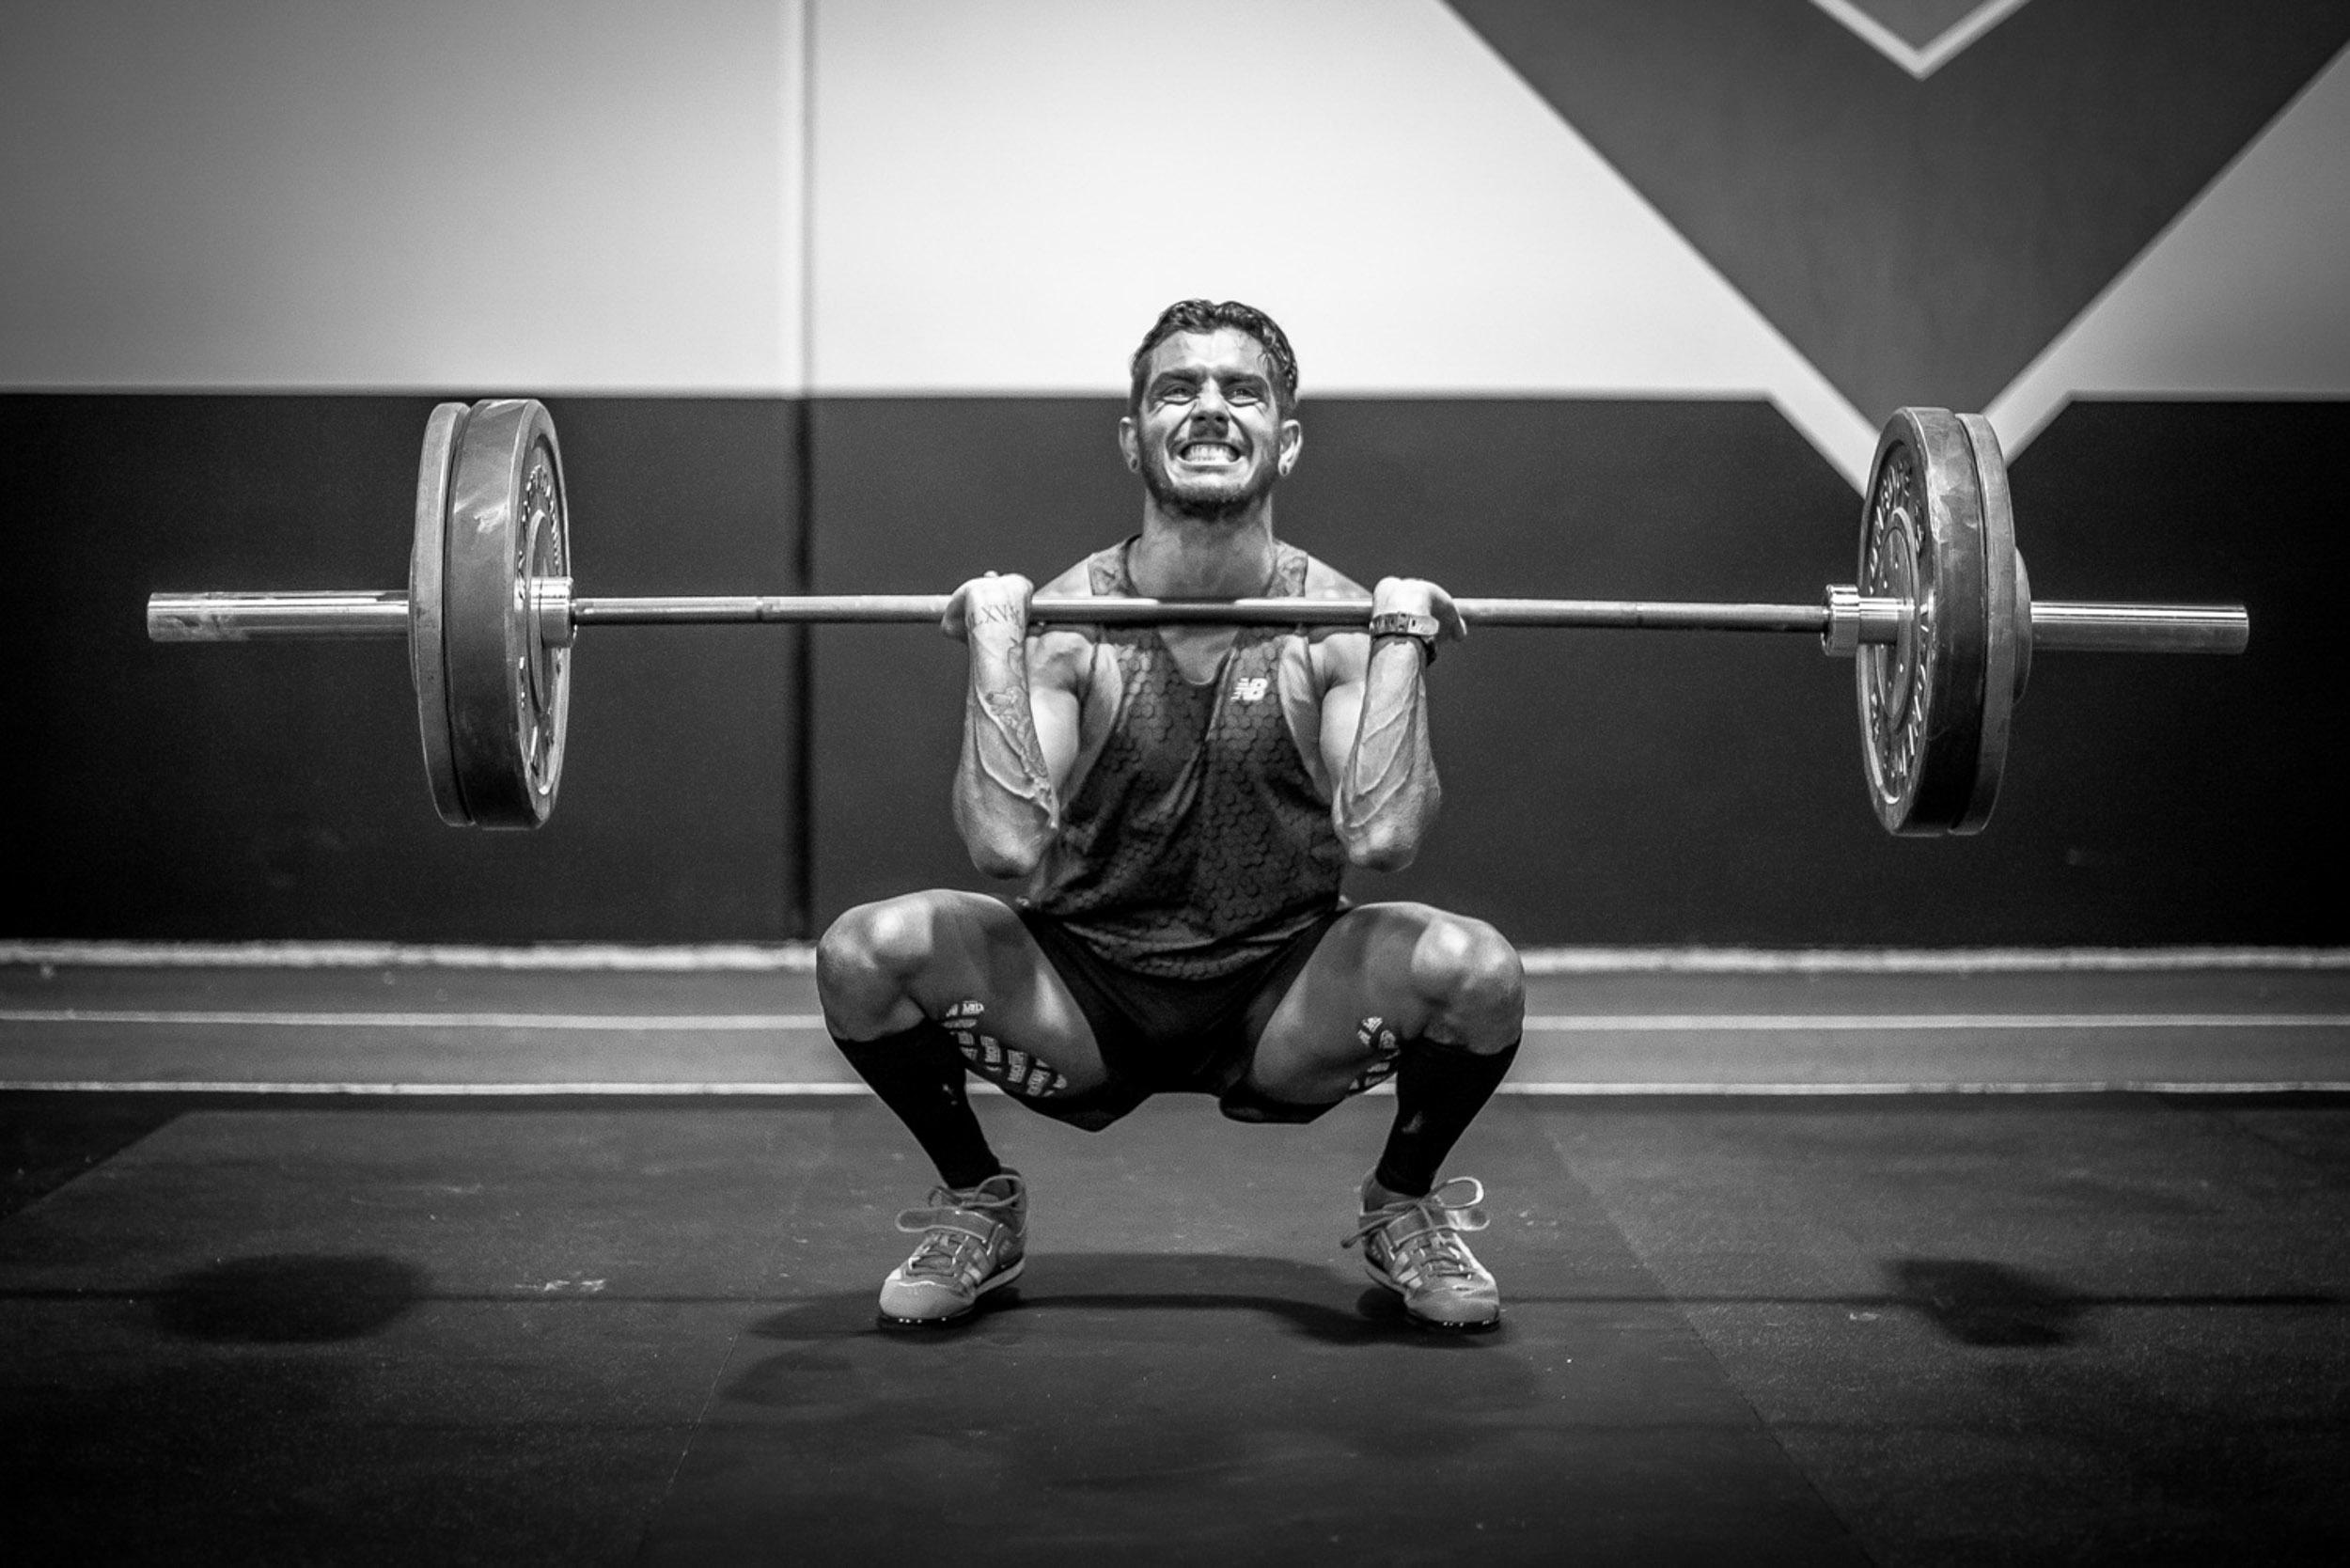 training_ops_sports_perfor_DSC_8828.jpg